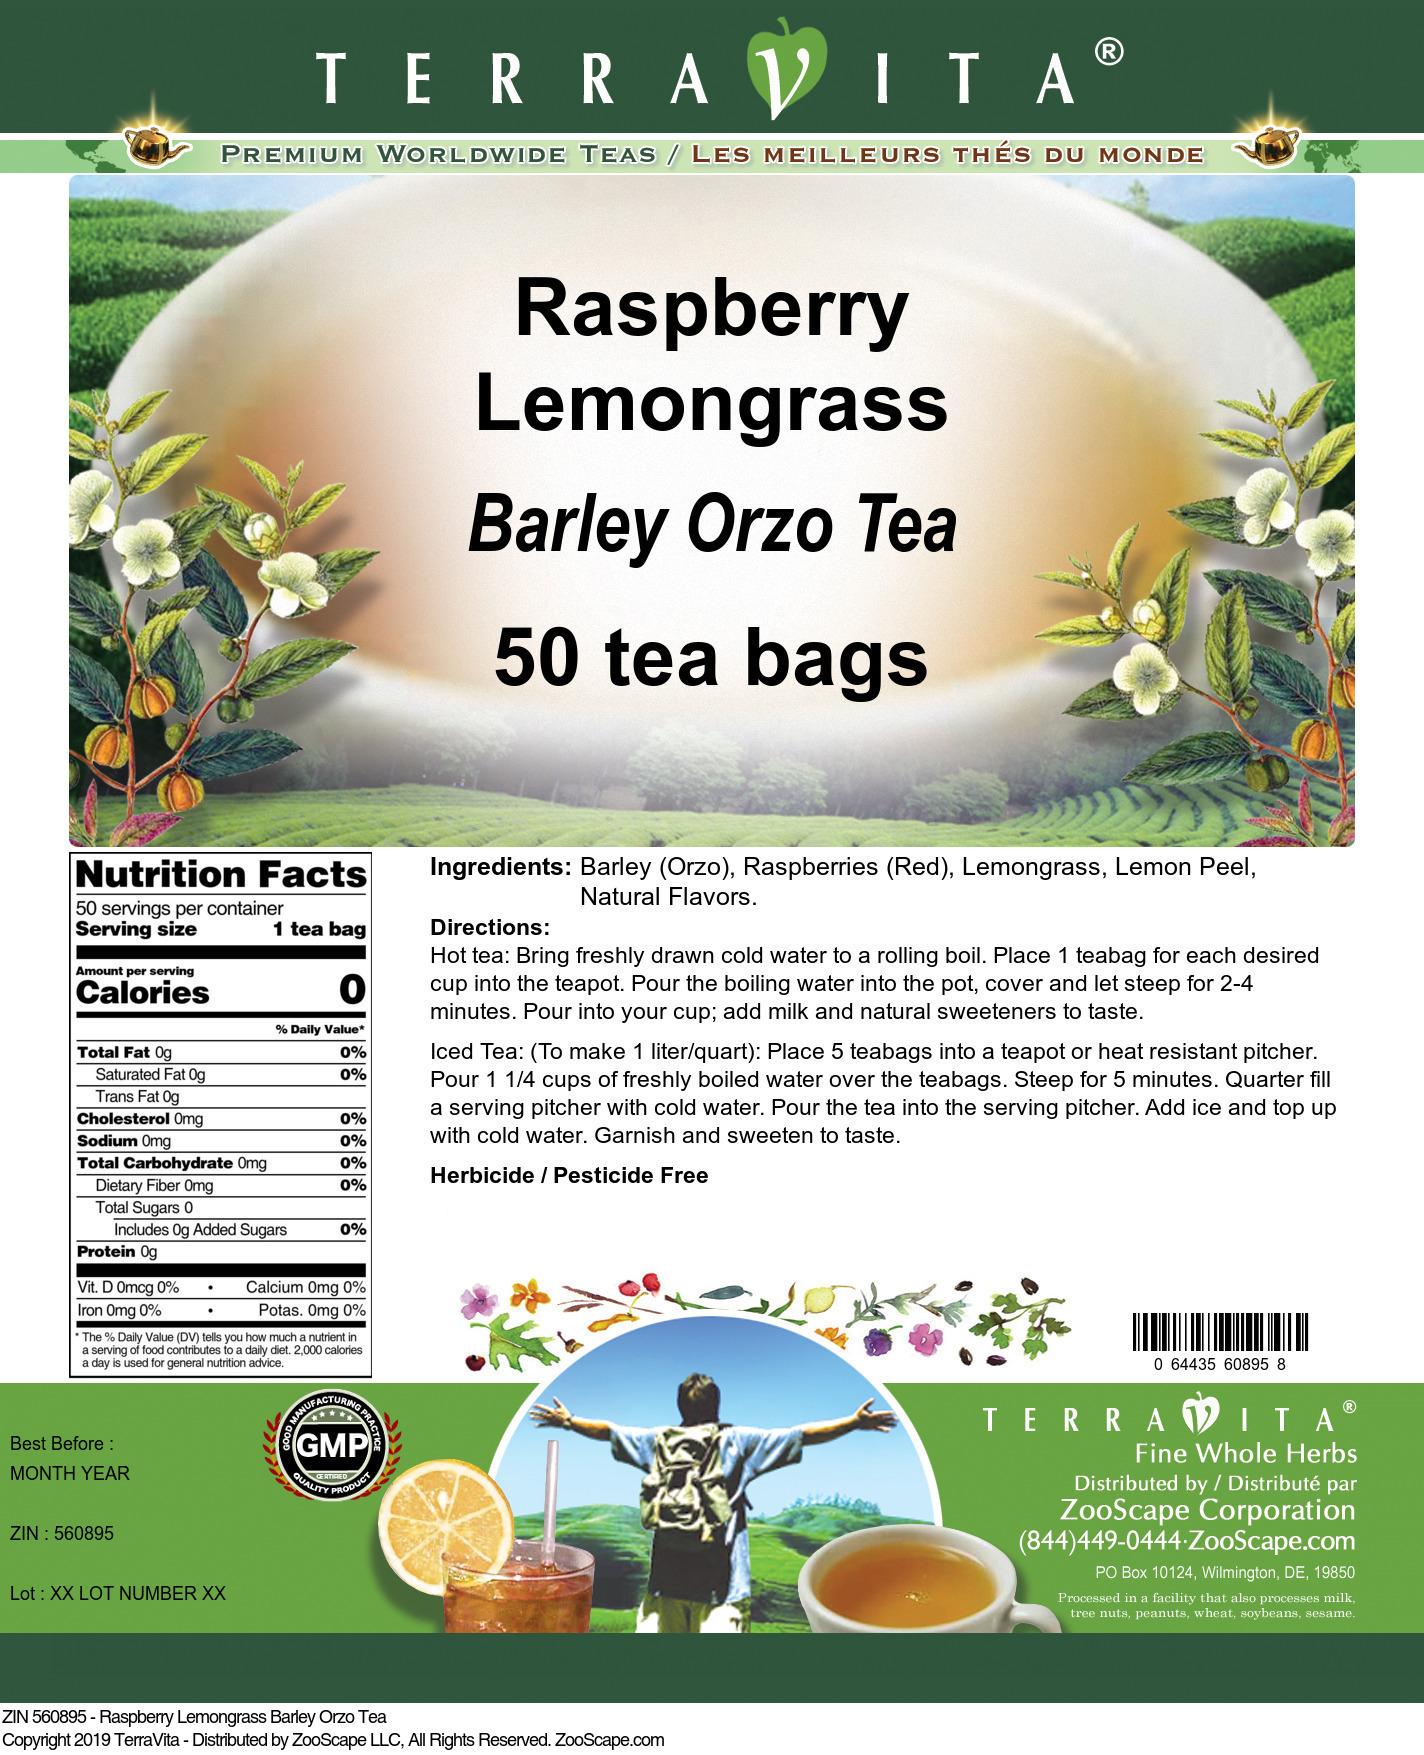 Raspberry Lemongrass Barley Orzo